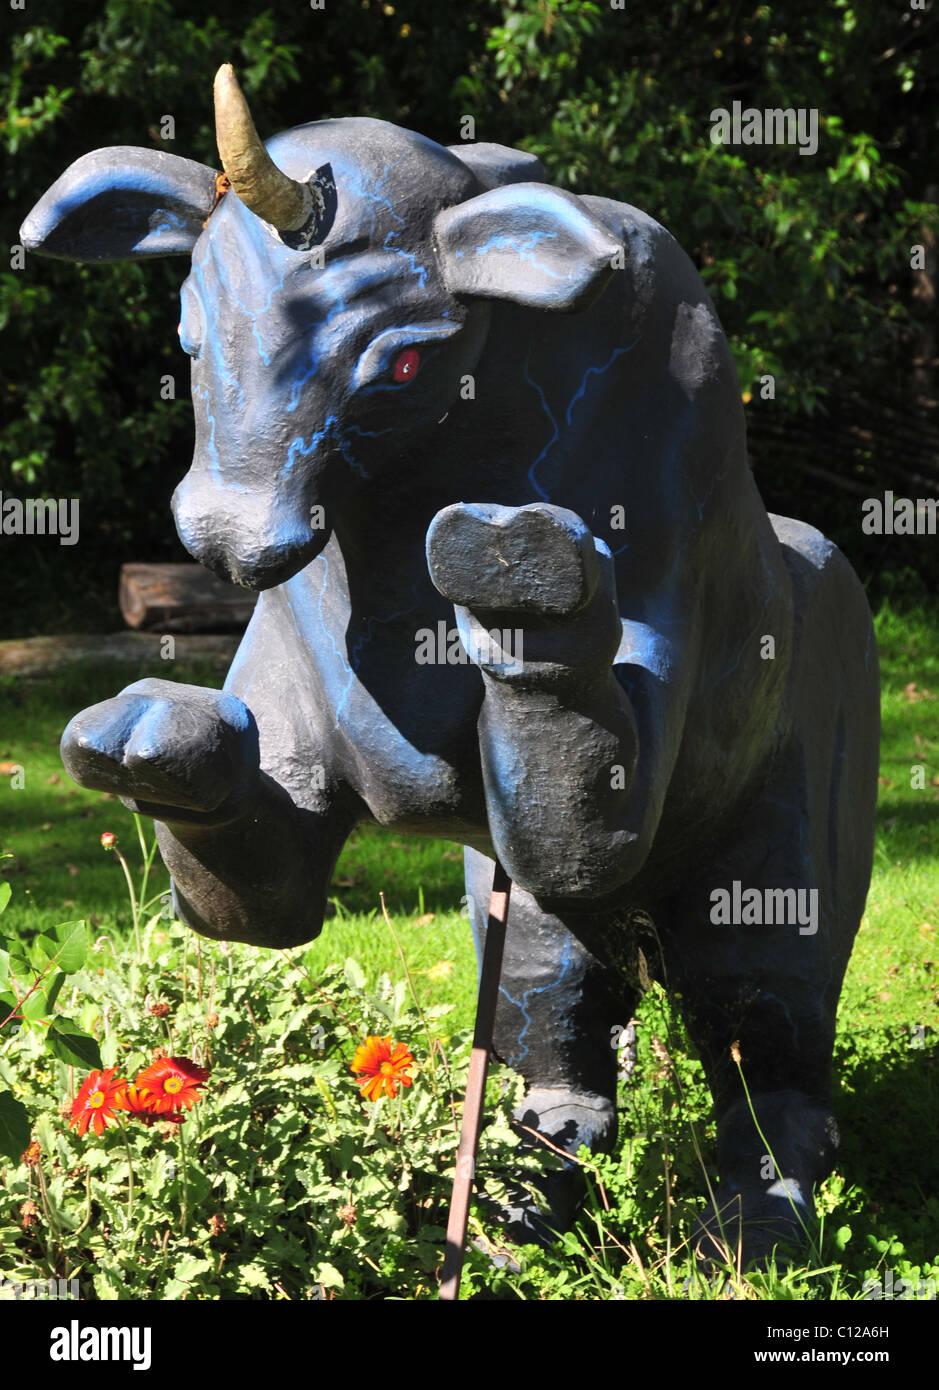 Sunny  portrait of a mythical blue bull-unicorn Camahueto effigy rearing above red garden flowers, Caulin, Chiloe Stock Photo